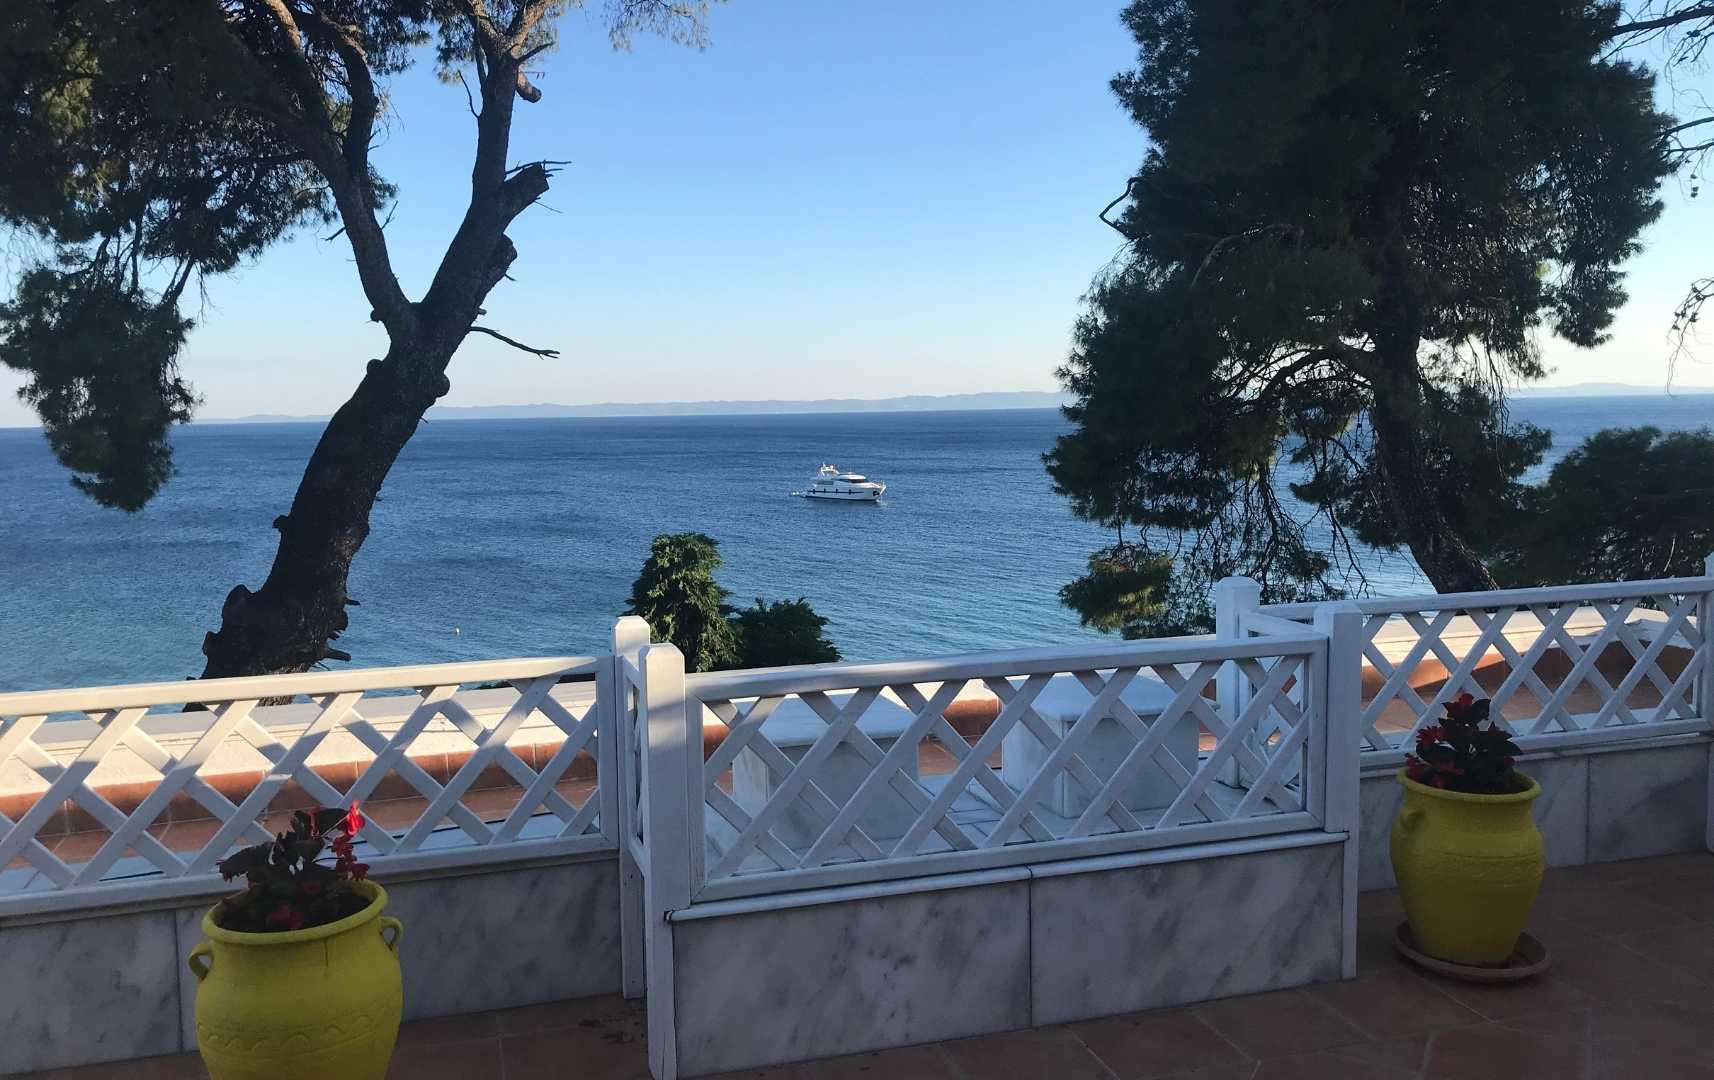 Danai Beach Resort - Chalkidiki